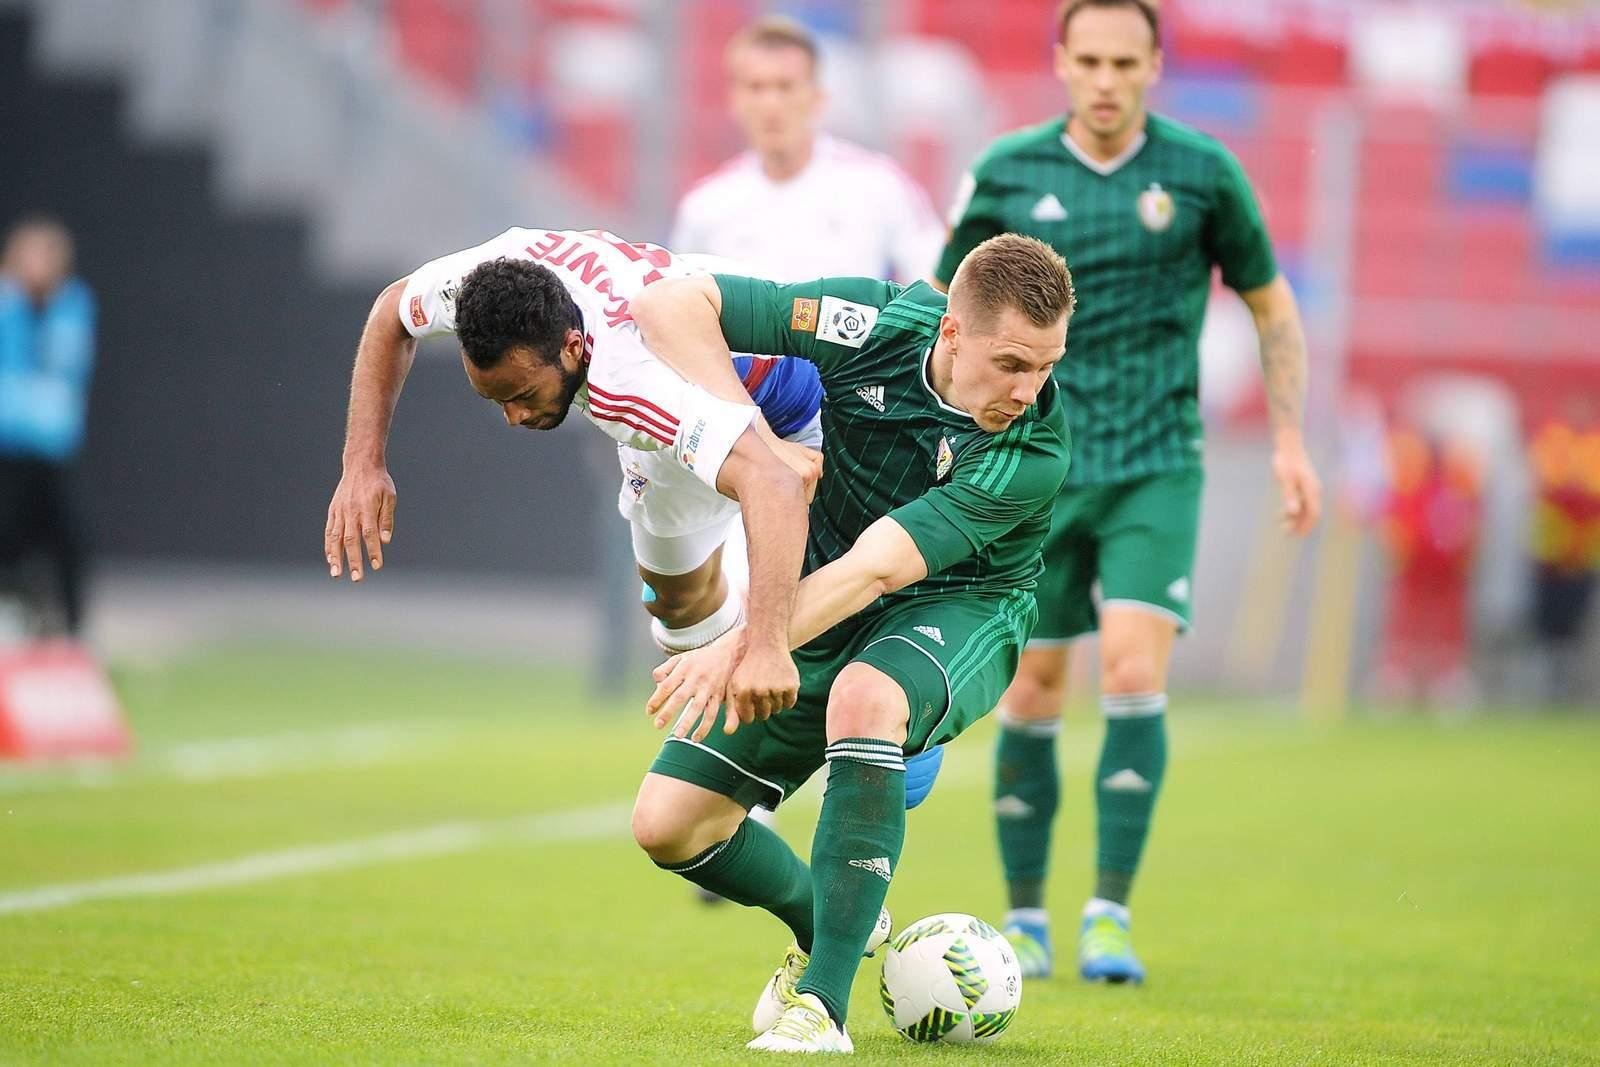 Tomasz Holota gewinnt Zweikampf